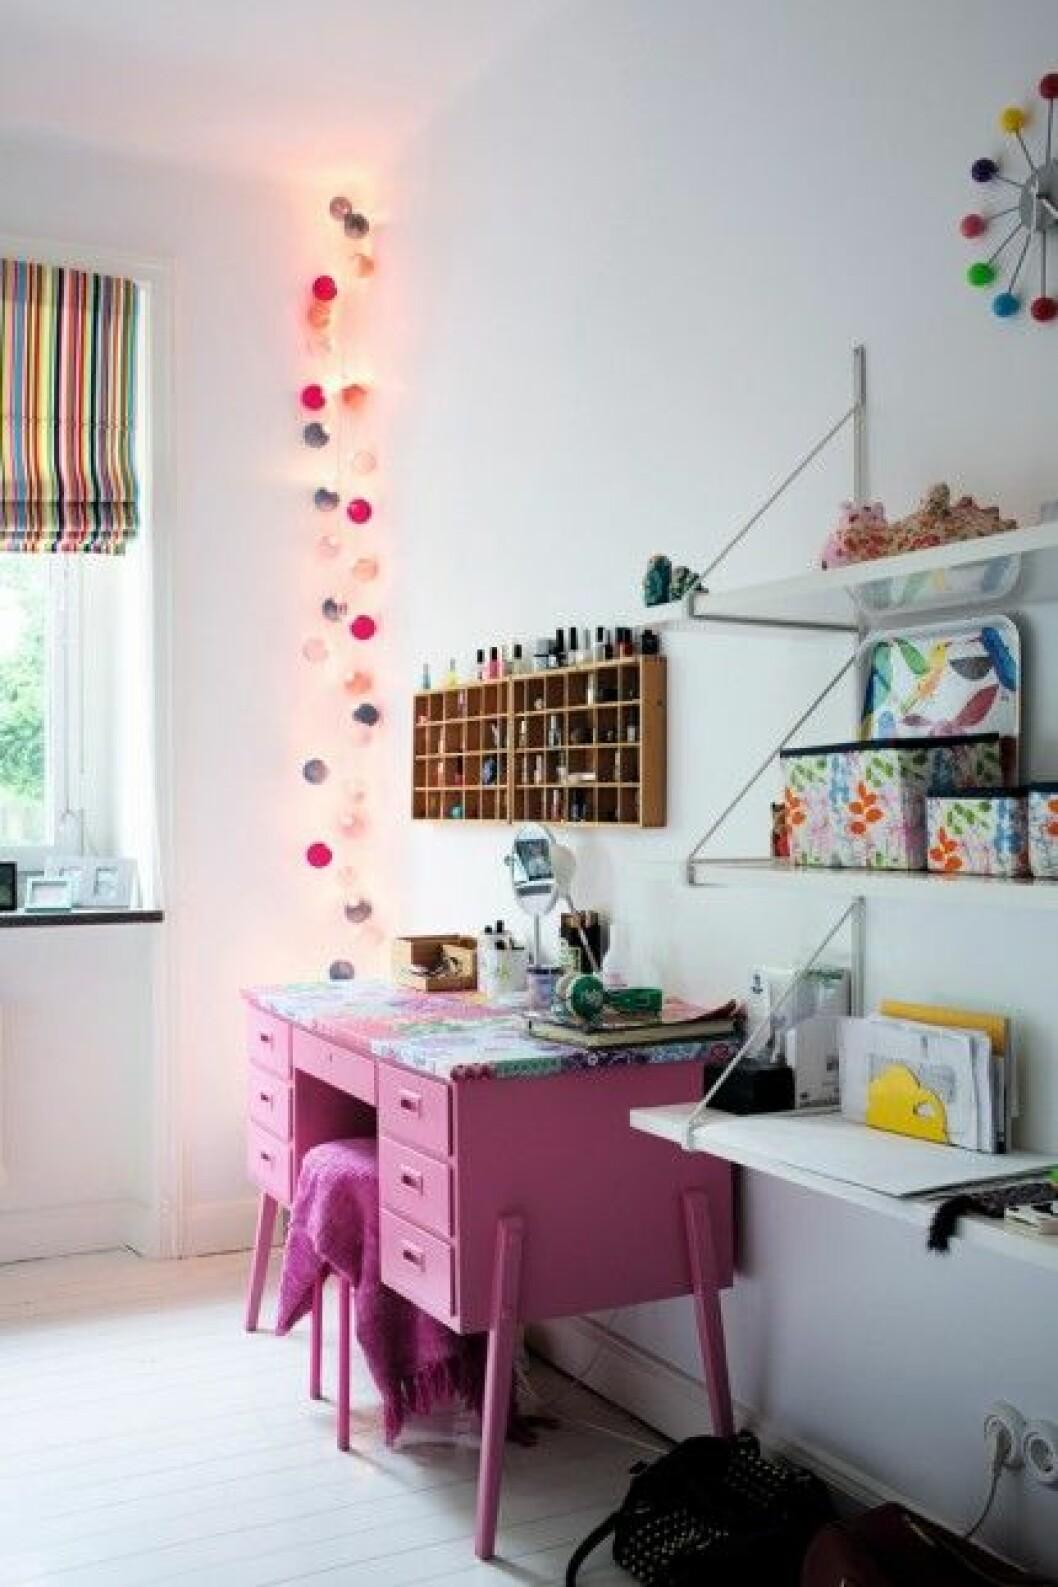 barnrum fargglad inspiration rosa skrivbord ljusslinga